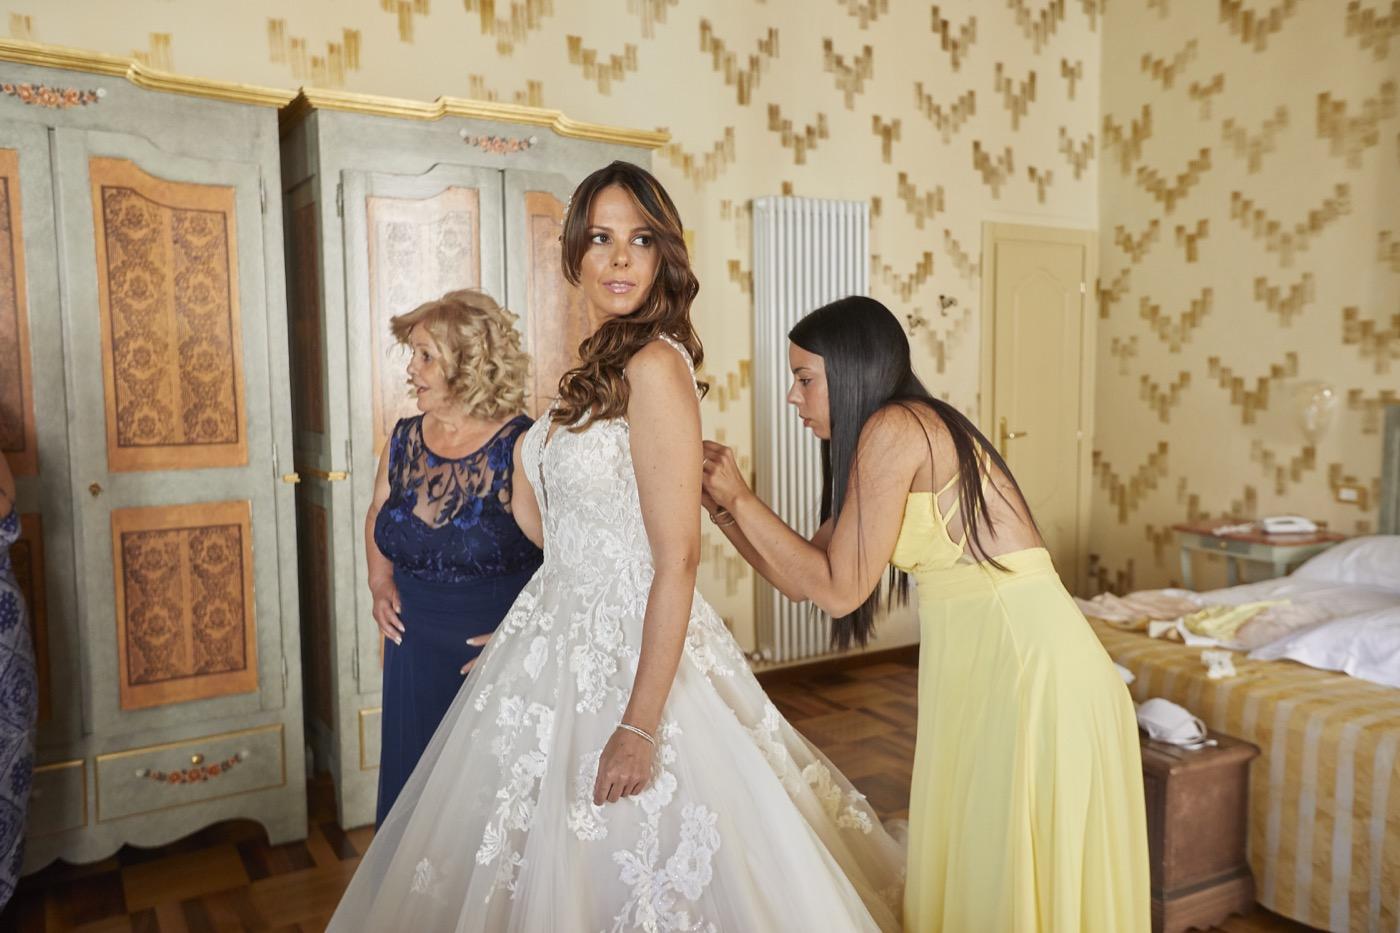 Claudio-Coppola-wedding-photographer-la-scuderia-eventi-preparativi-la-rosetta-perugia-20